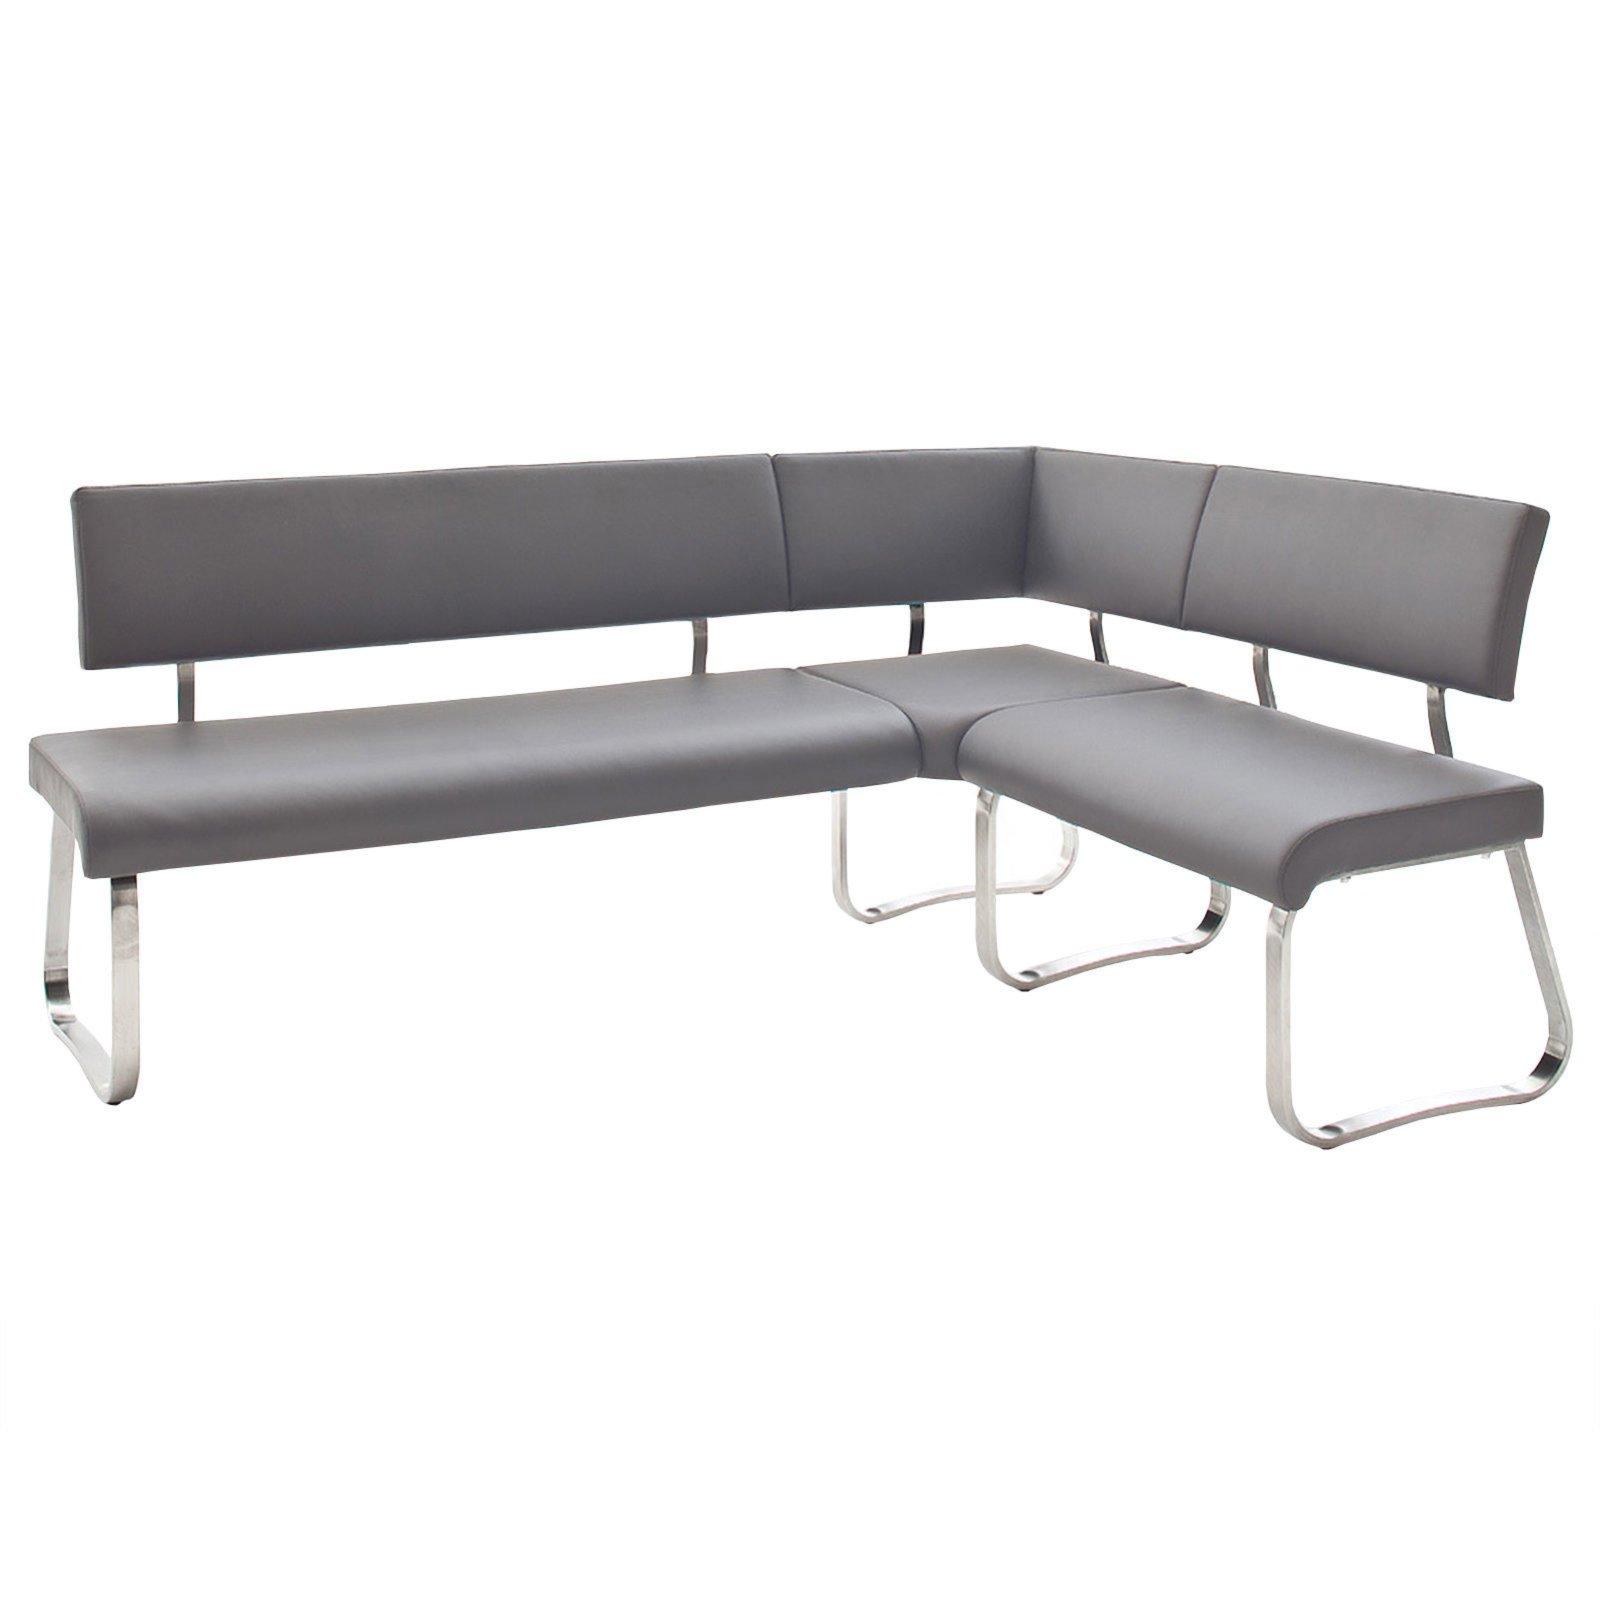 eckbank arco grau kunstleder 200x150 cm eckb nke b nke m bel roller m belhaus. Black Bedroom Furniture Sets. Home Design Ideas